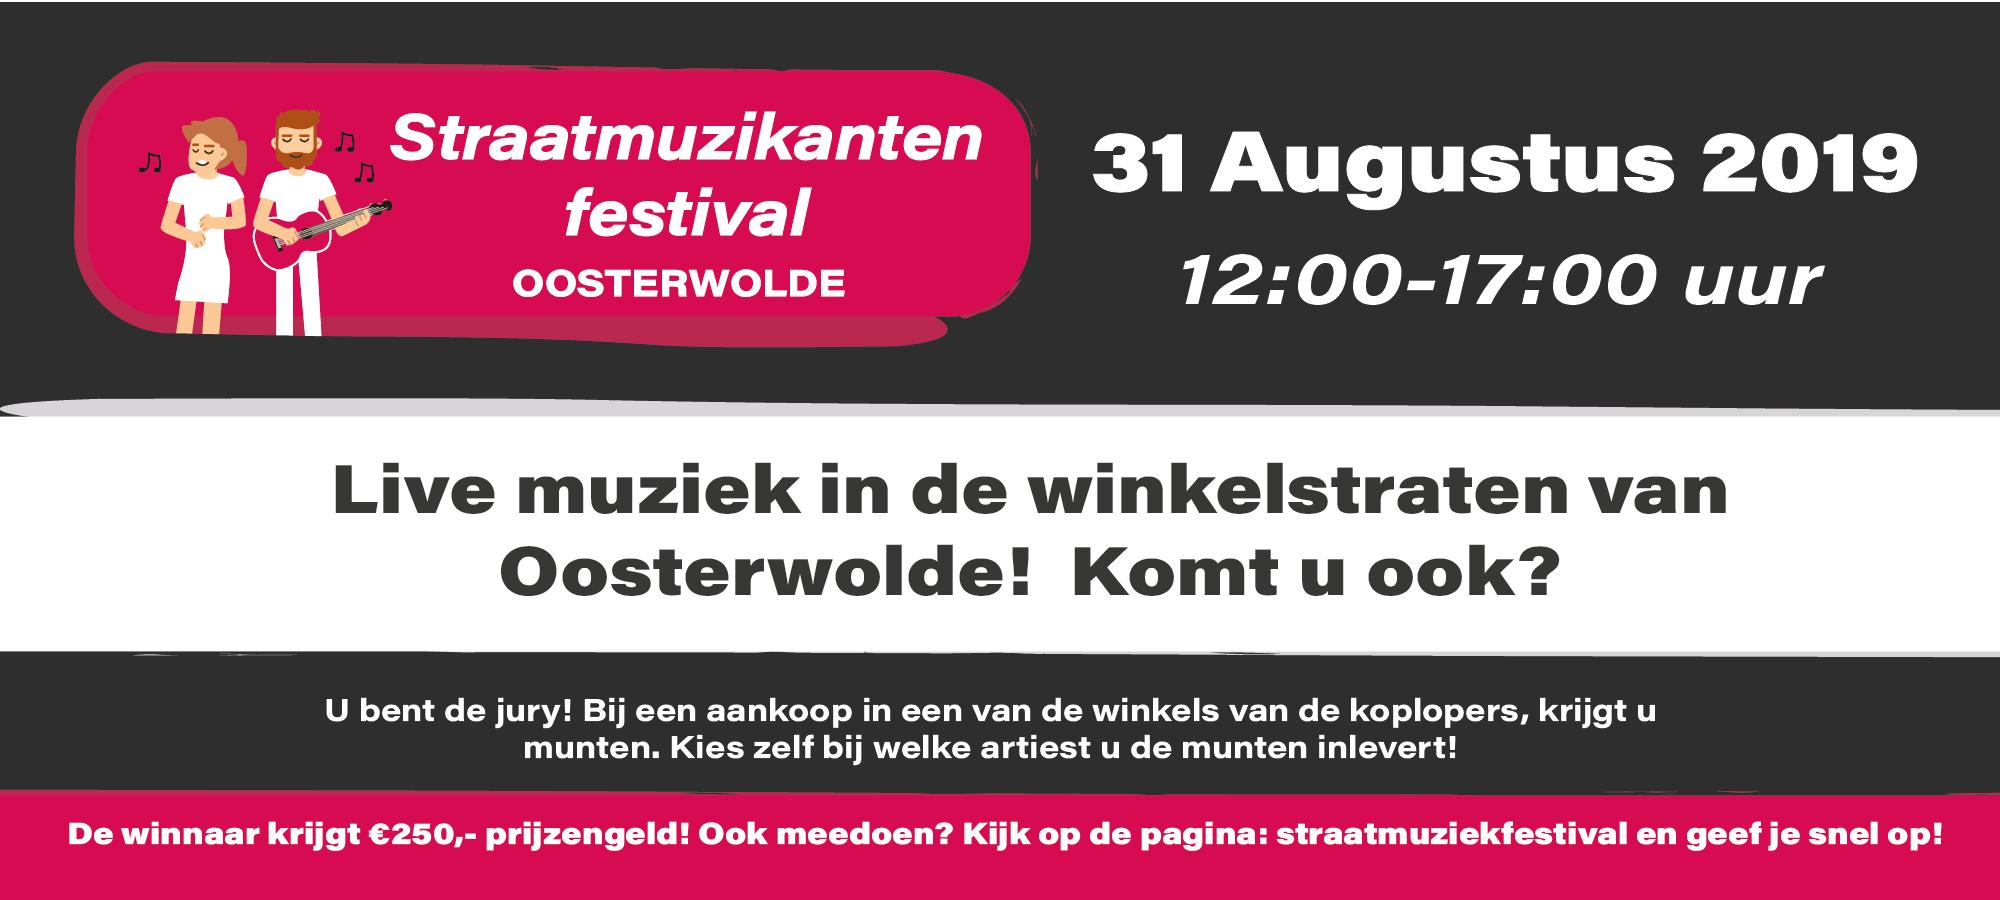 Website Banner - Straatmuziekfestivaloosterwolde